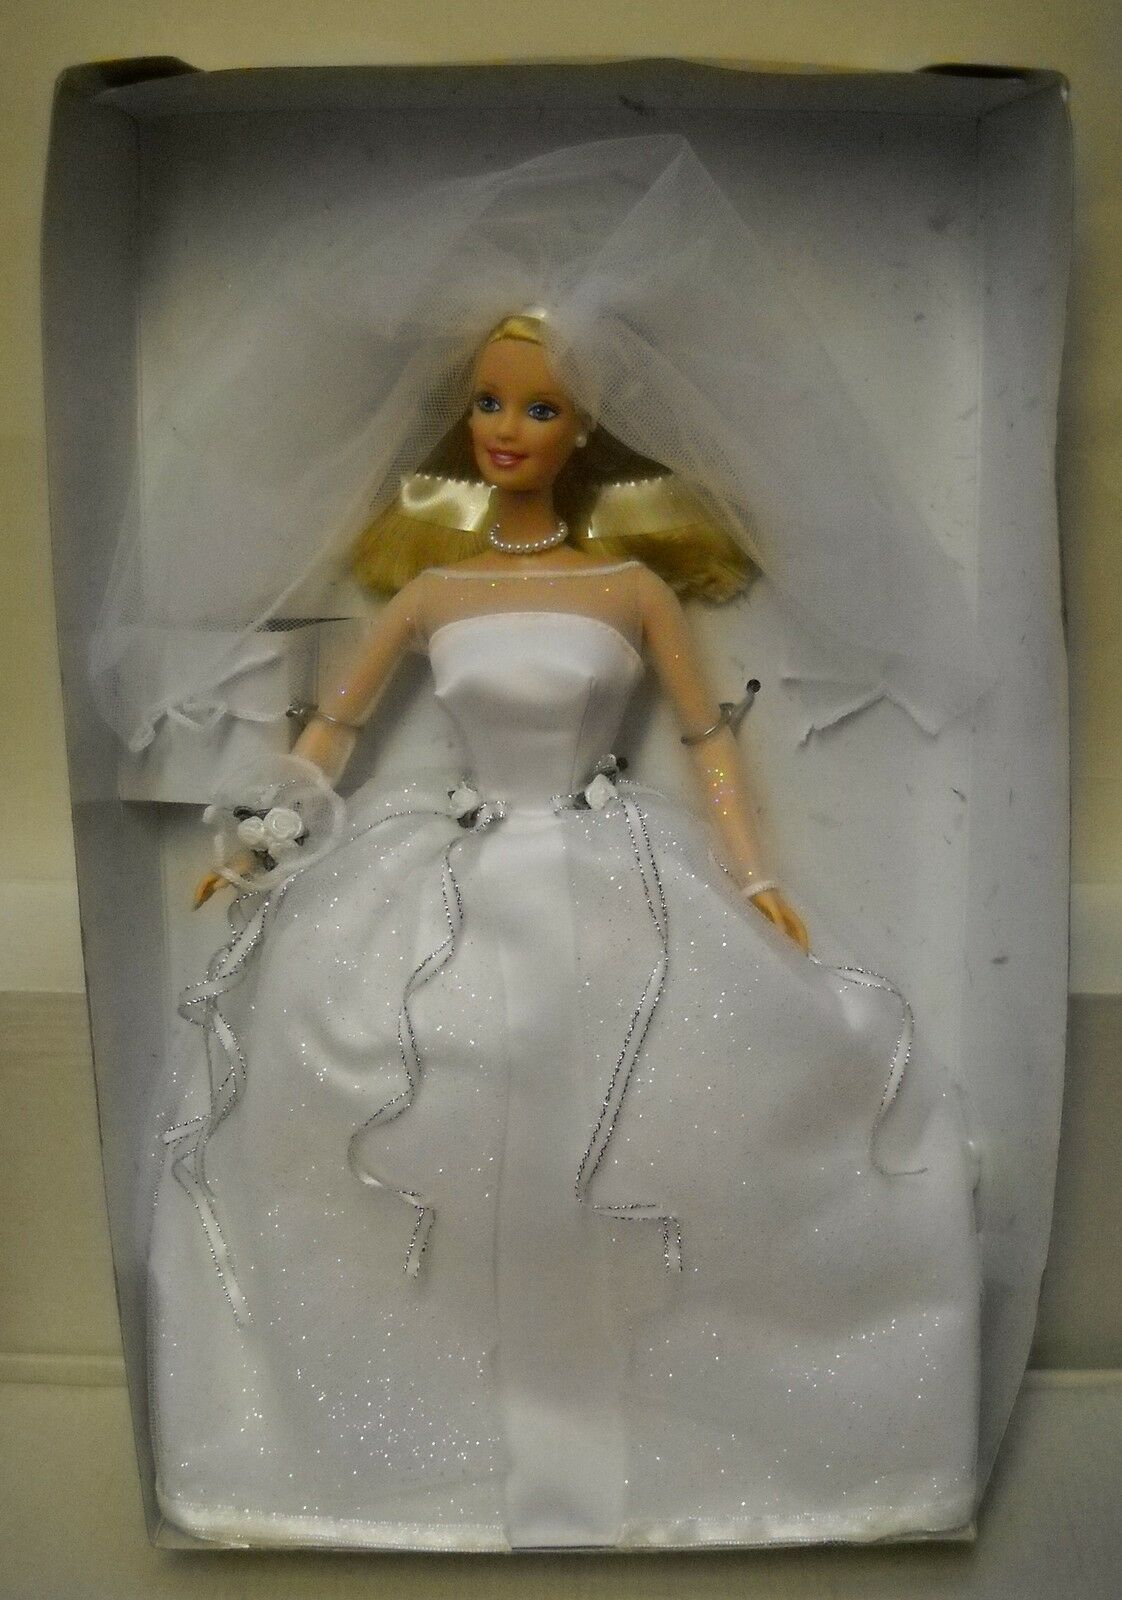 Nuevo Caja conectados a Forro Mattel Barbie Avon catálogo azulshing Bride